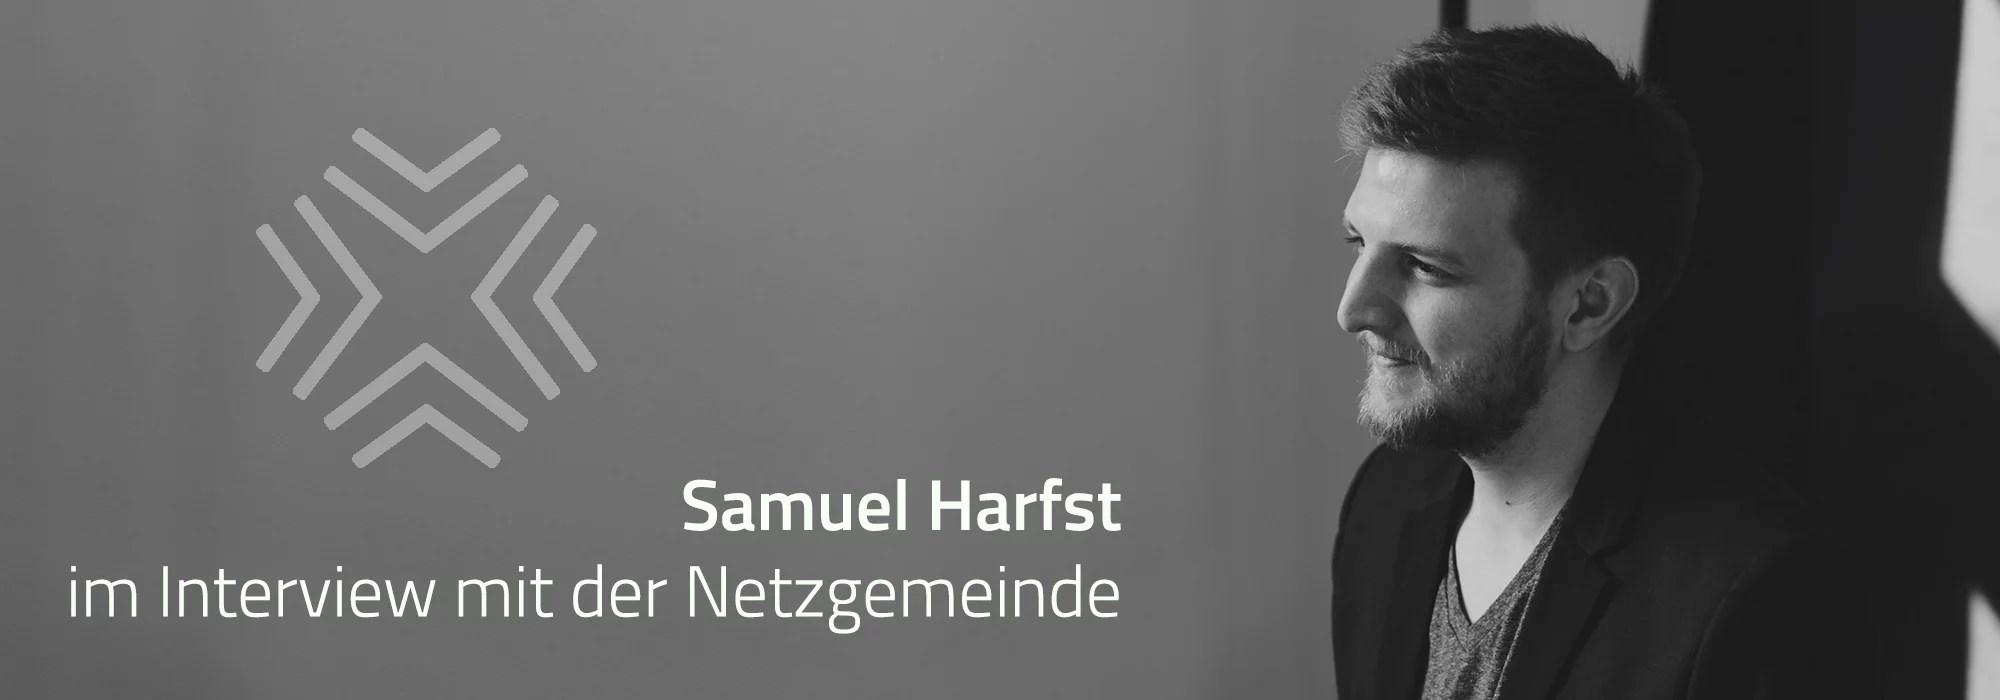 Samuel Harsft